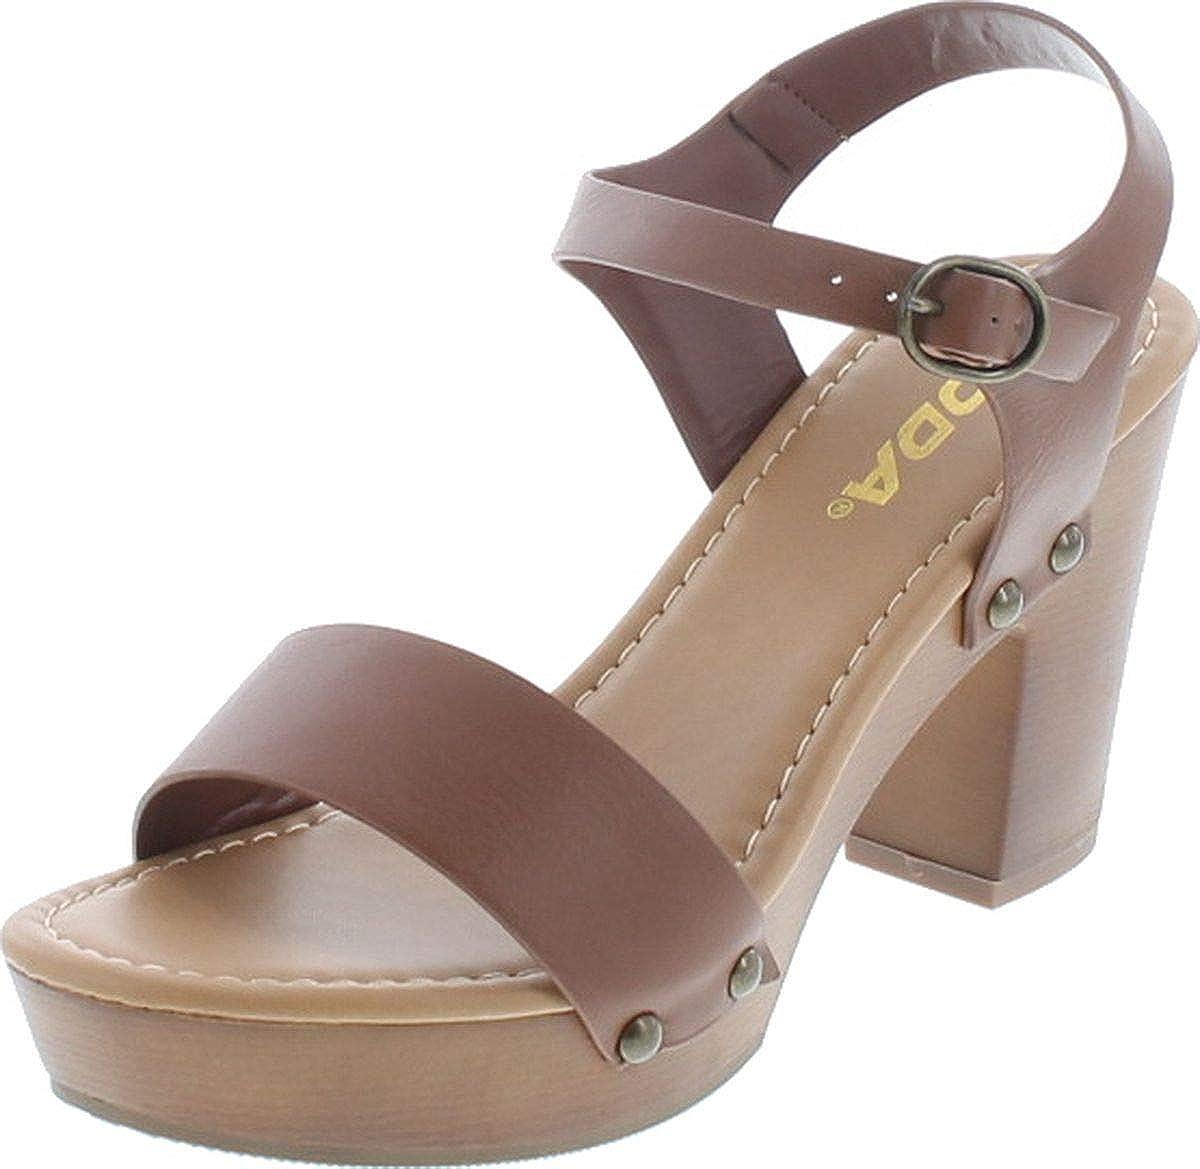 Soda CHIVAS ~ Women's Bold Buckles Studded Wedge Sandal